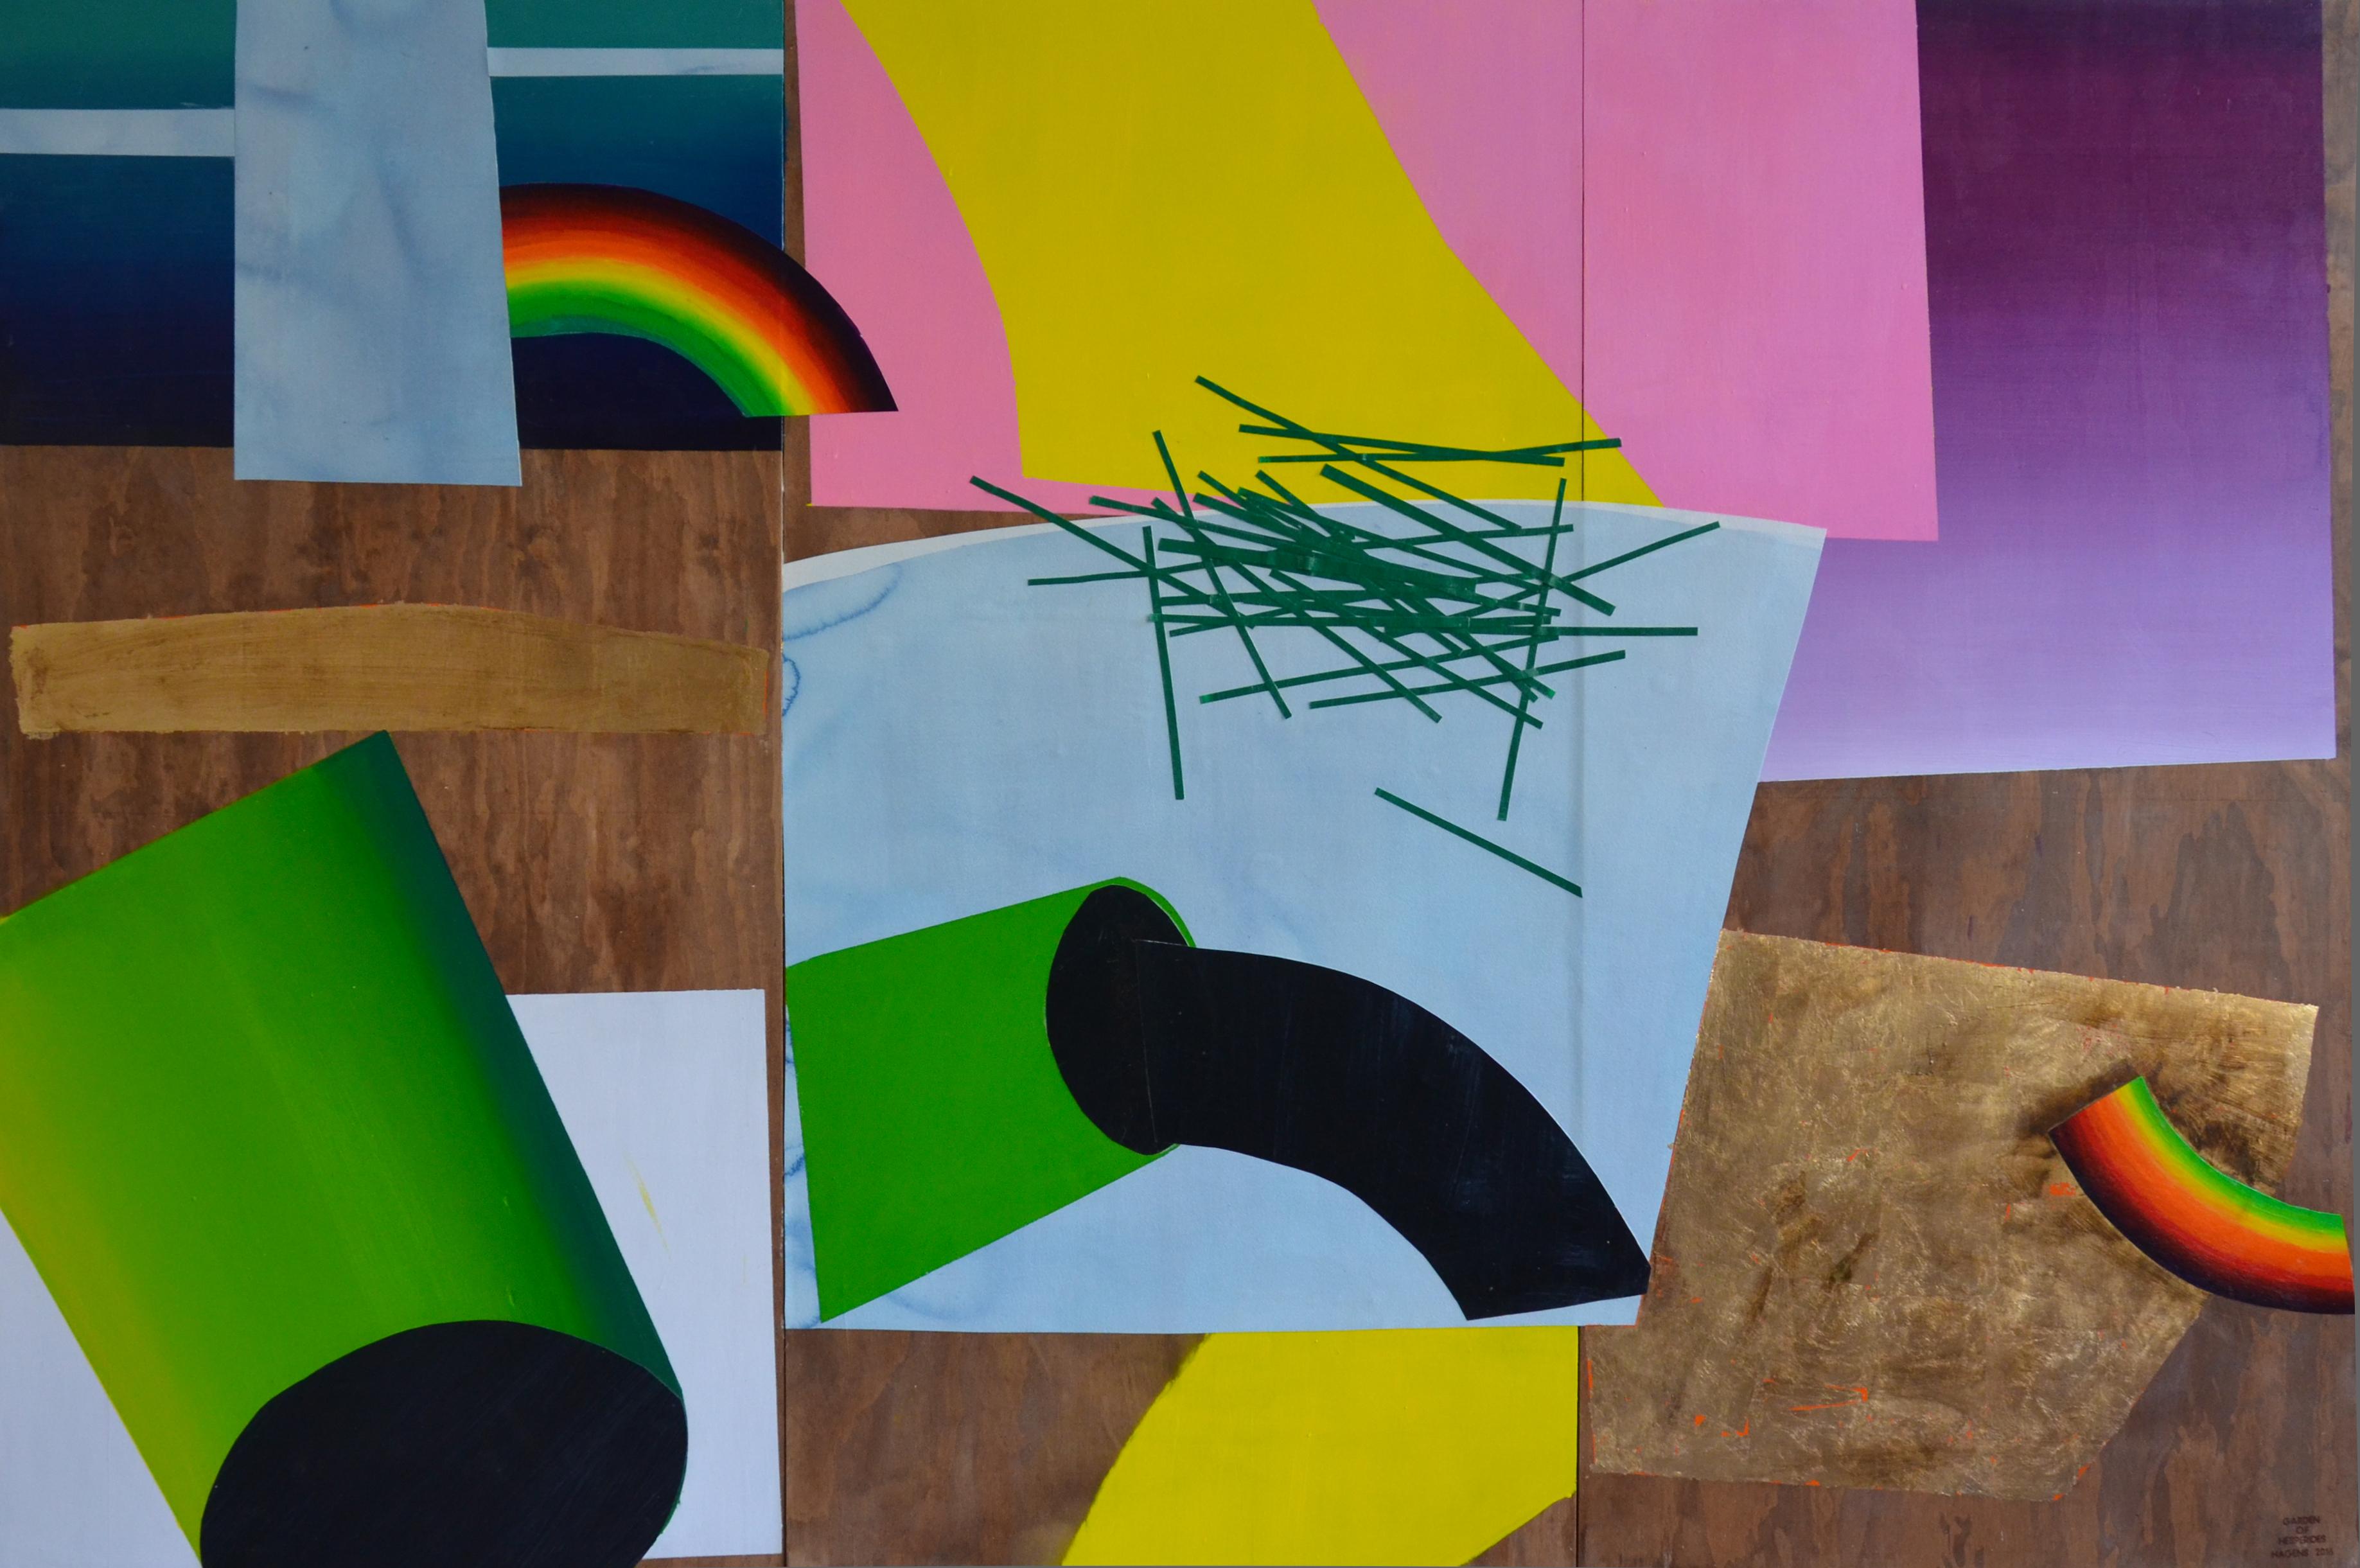 Garden of Hesperides #28 | 180 x 270 cm | Papier, acrylverf, bladgoud op paneel | 2016 | Sasja Hagens | Gallery Untitled